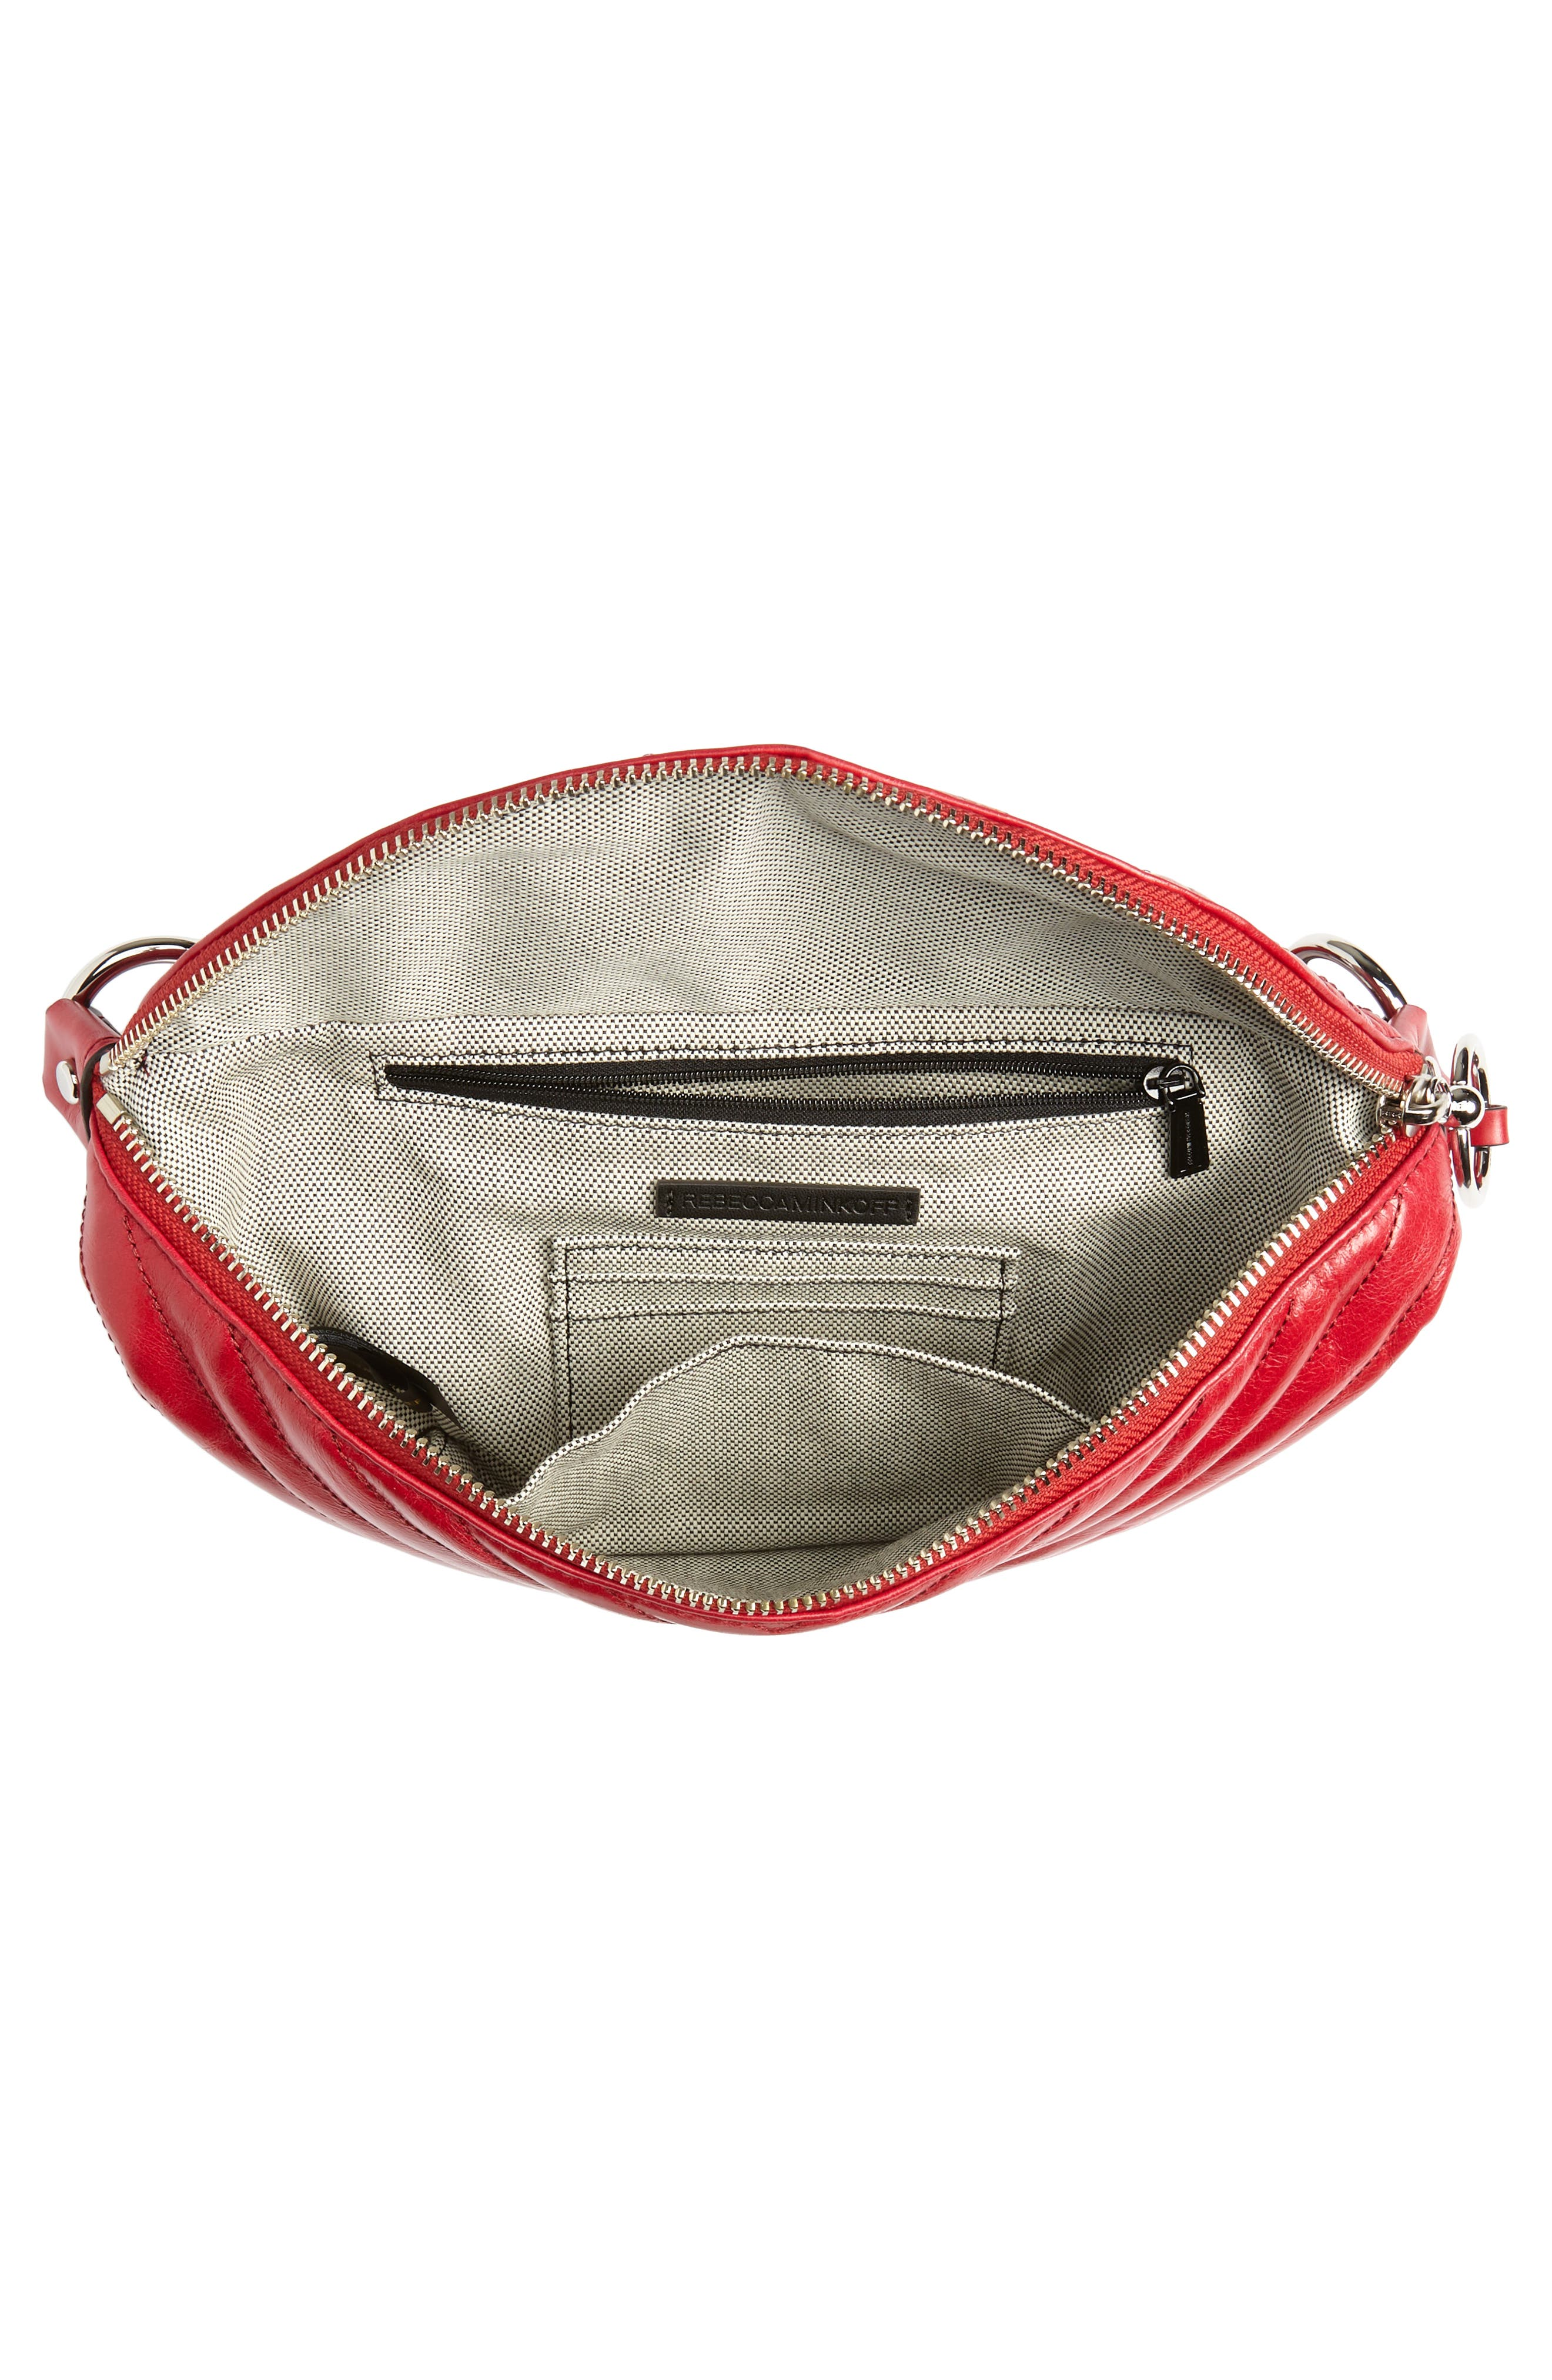 REBECCA MINKOFF, Edie Leather Belt Bag, Alternate thumbnail 6, color, 600